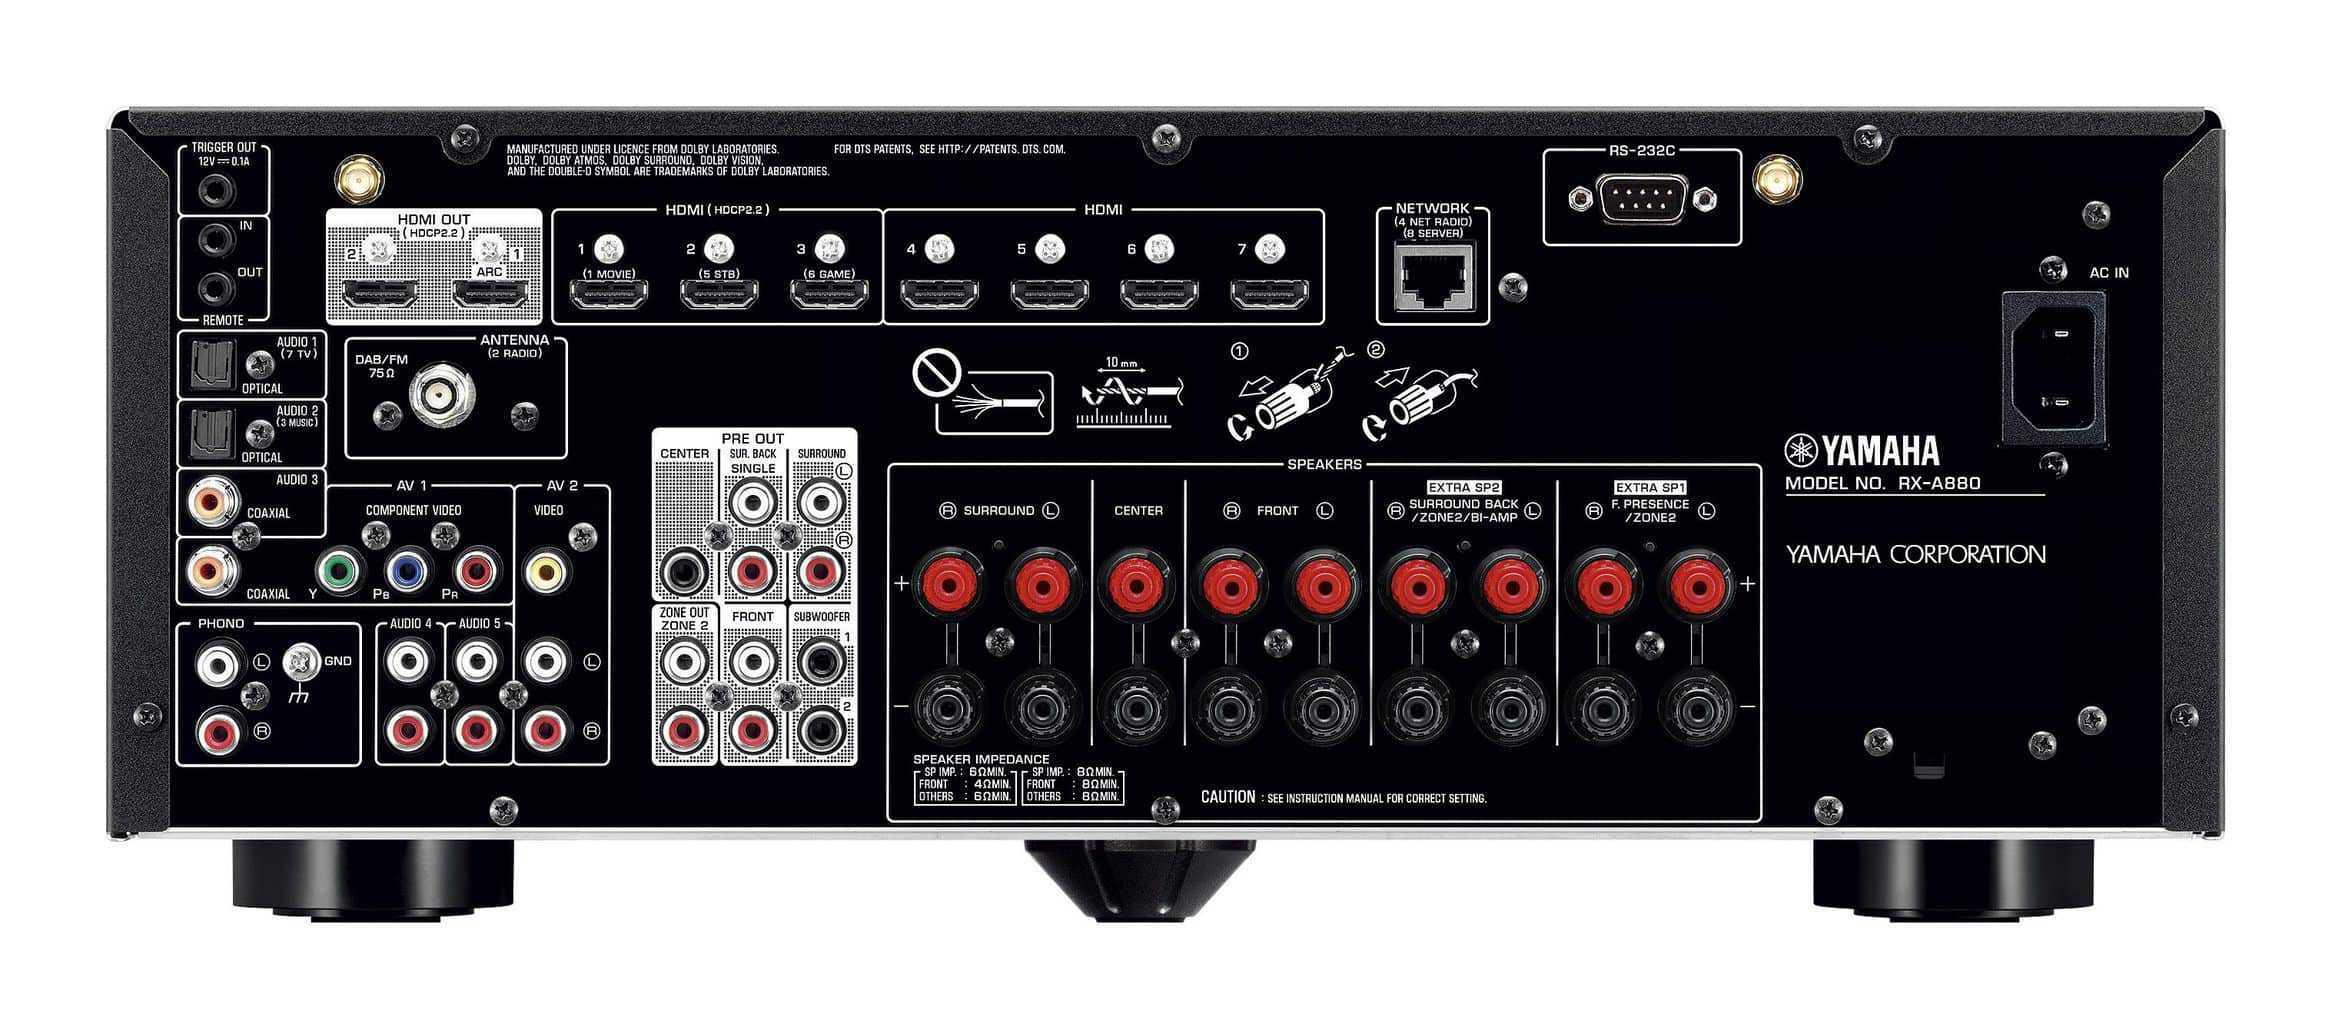 Yamaha rx a880 7 2 kanal aventage heimkinopartner for Yamaha rx v450 av receiver price